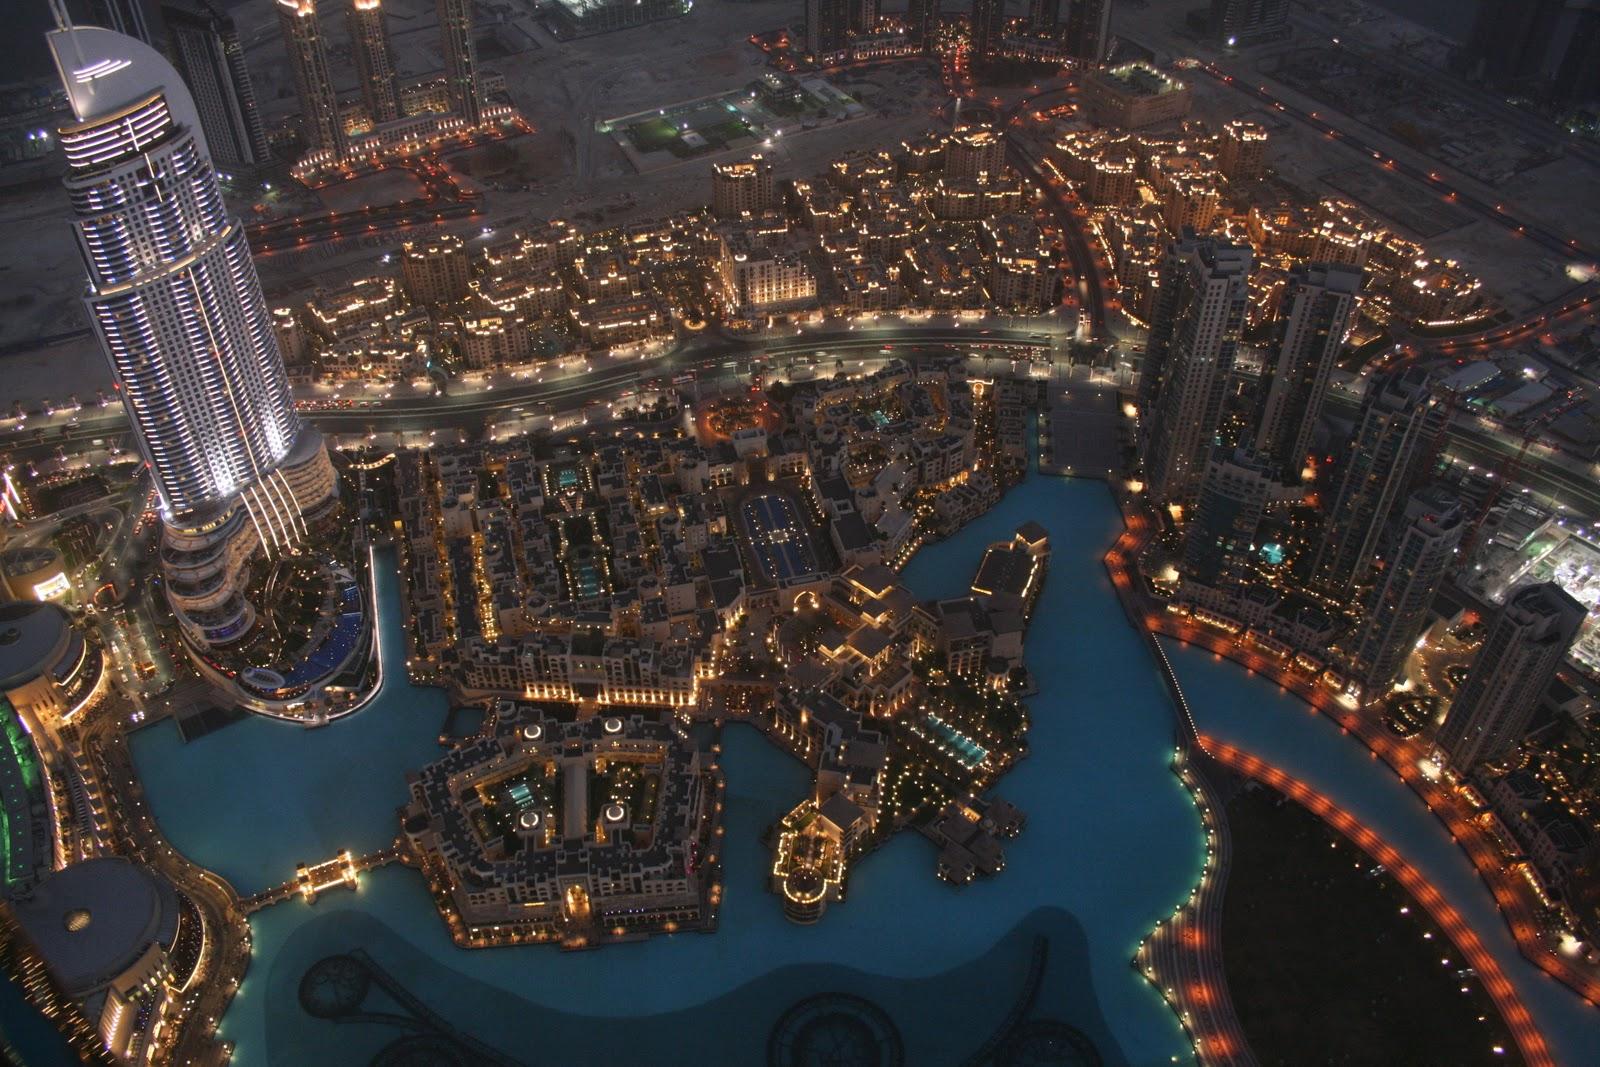 Entrez Svp Burj Khalifa